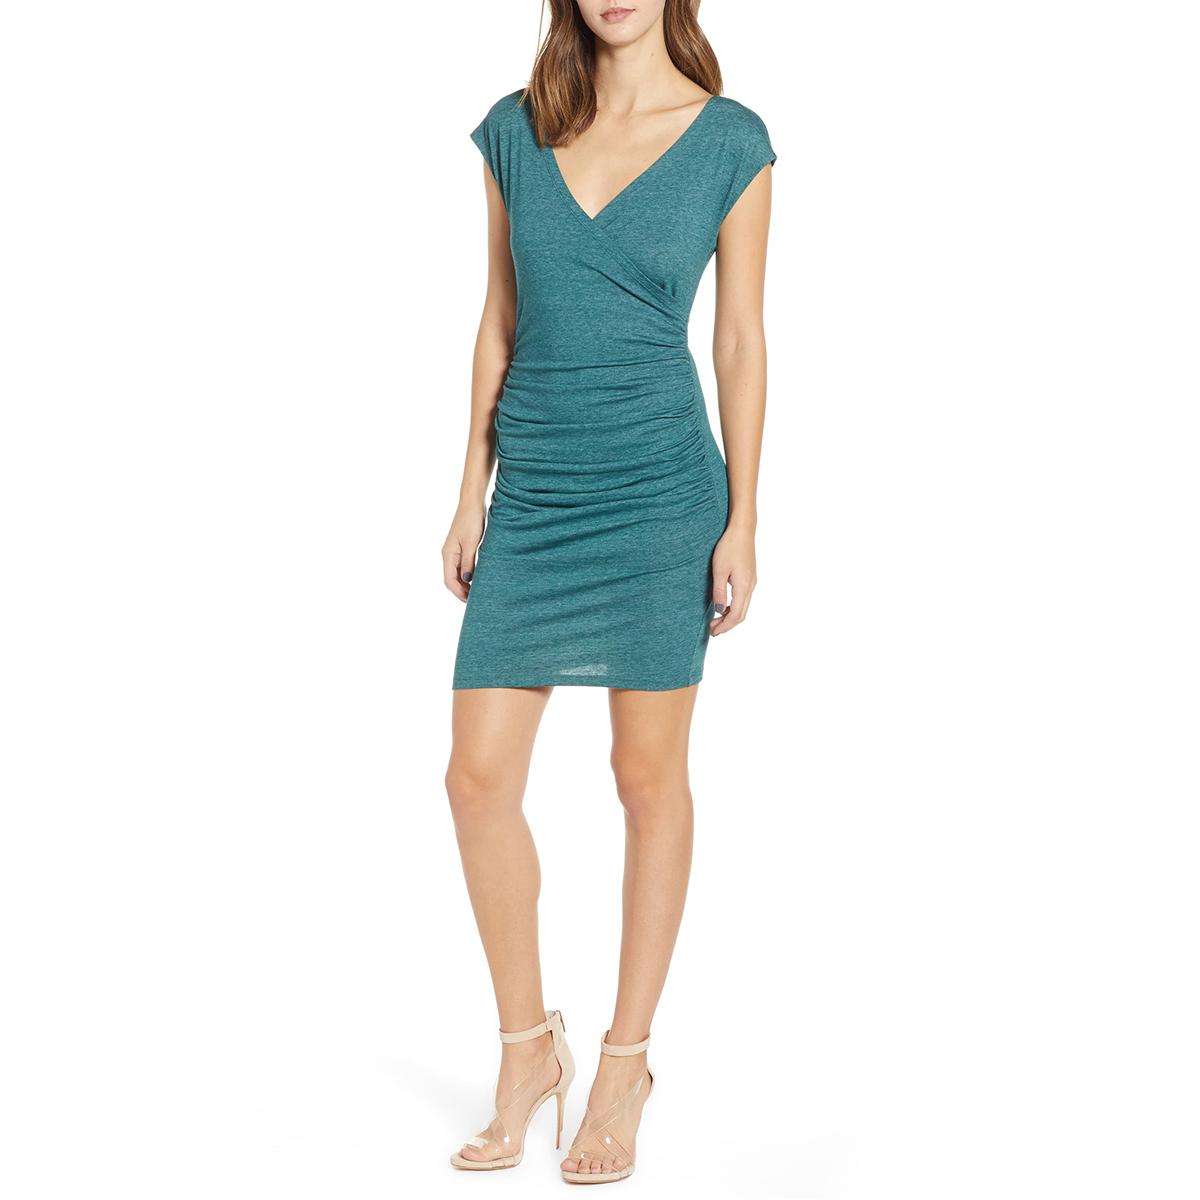 Teal Surplice Dress